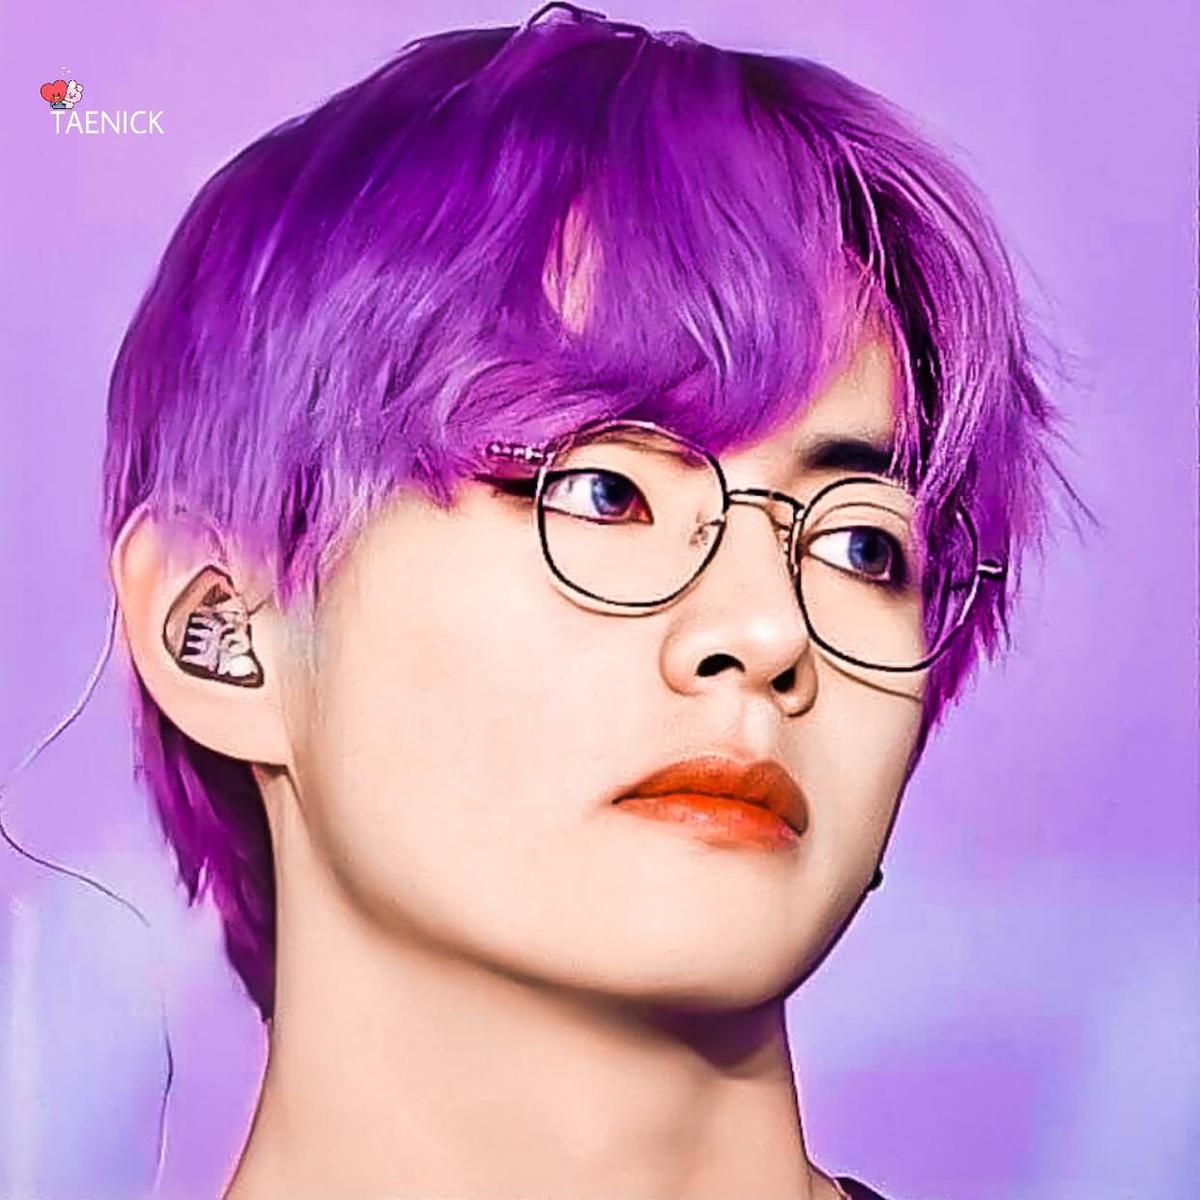 Taehyung oppa, please put your purple hair in a new comeback 😍💜🌈 #TaehyungPurpleHair  #TaehyungHairPurple  #TaehyungPurple  #ExaARMY https://t.co/4jJdKG3DAS